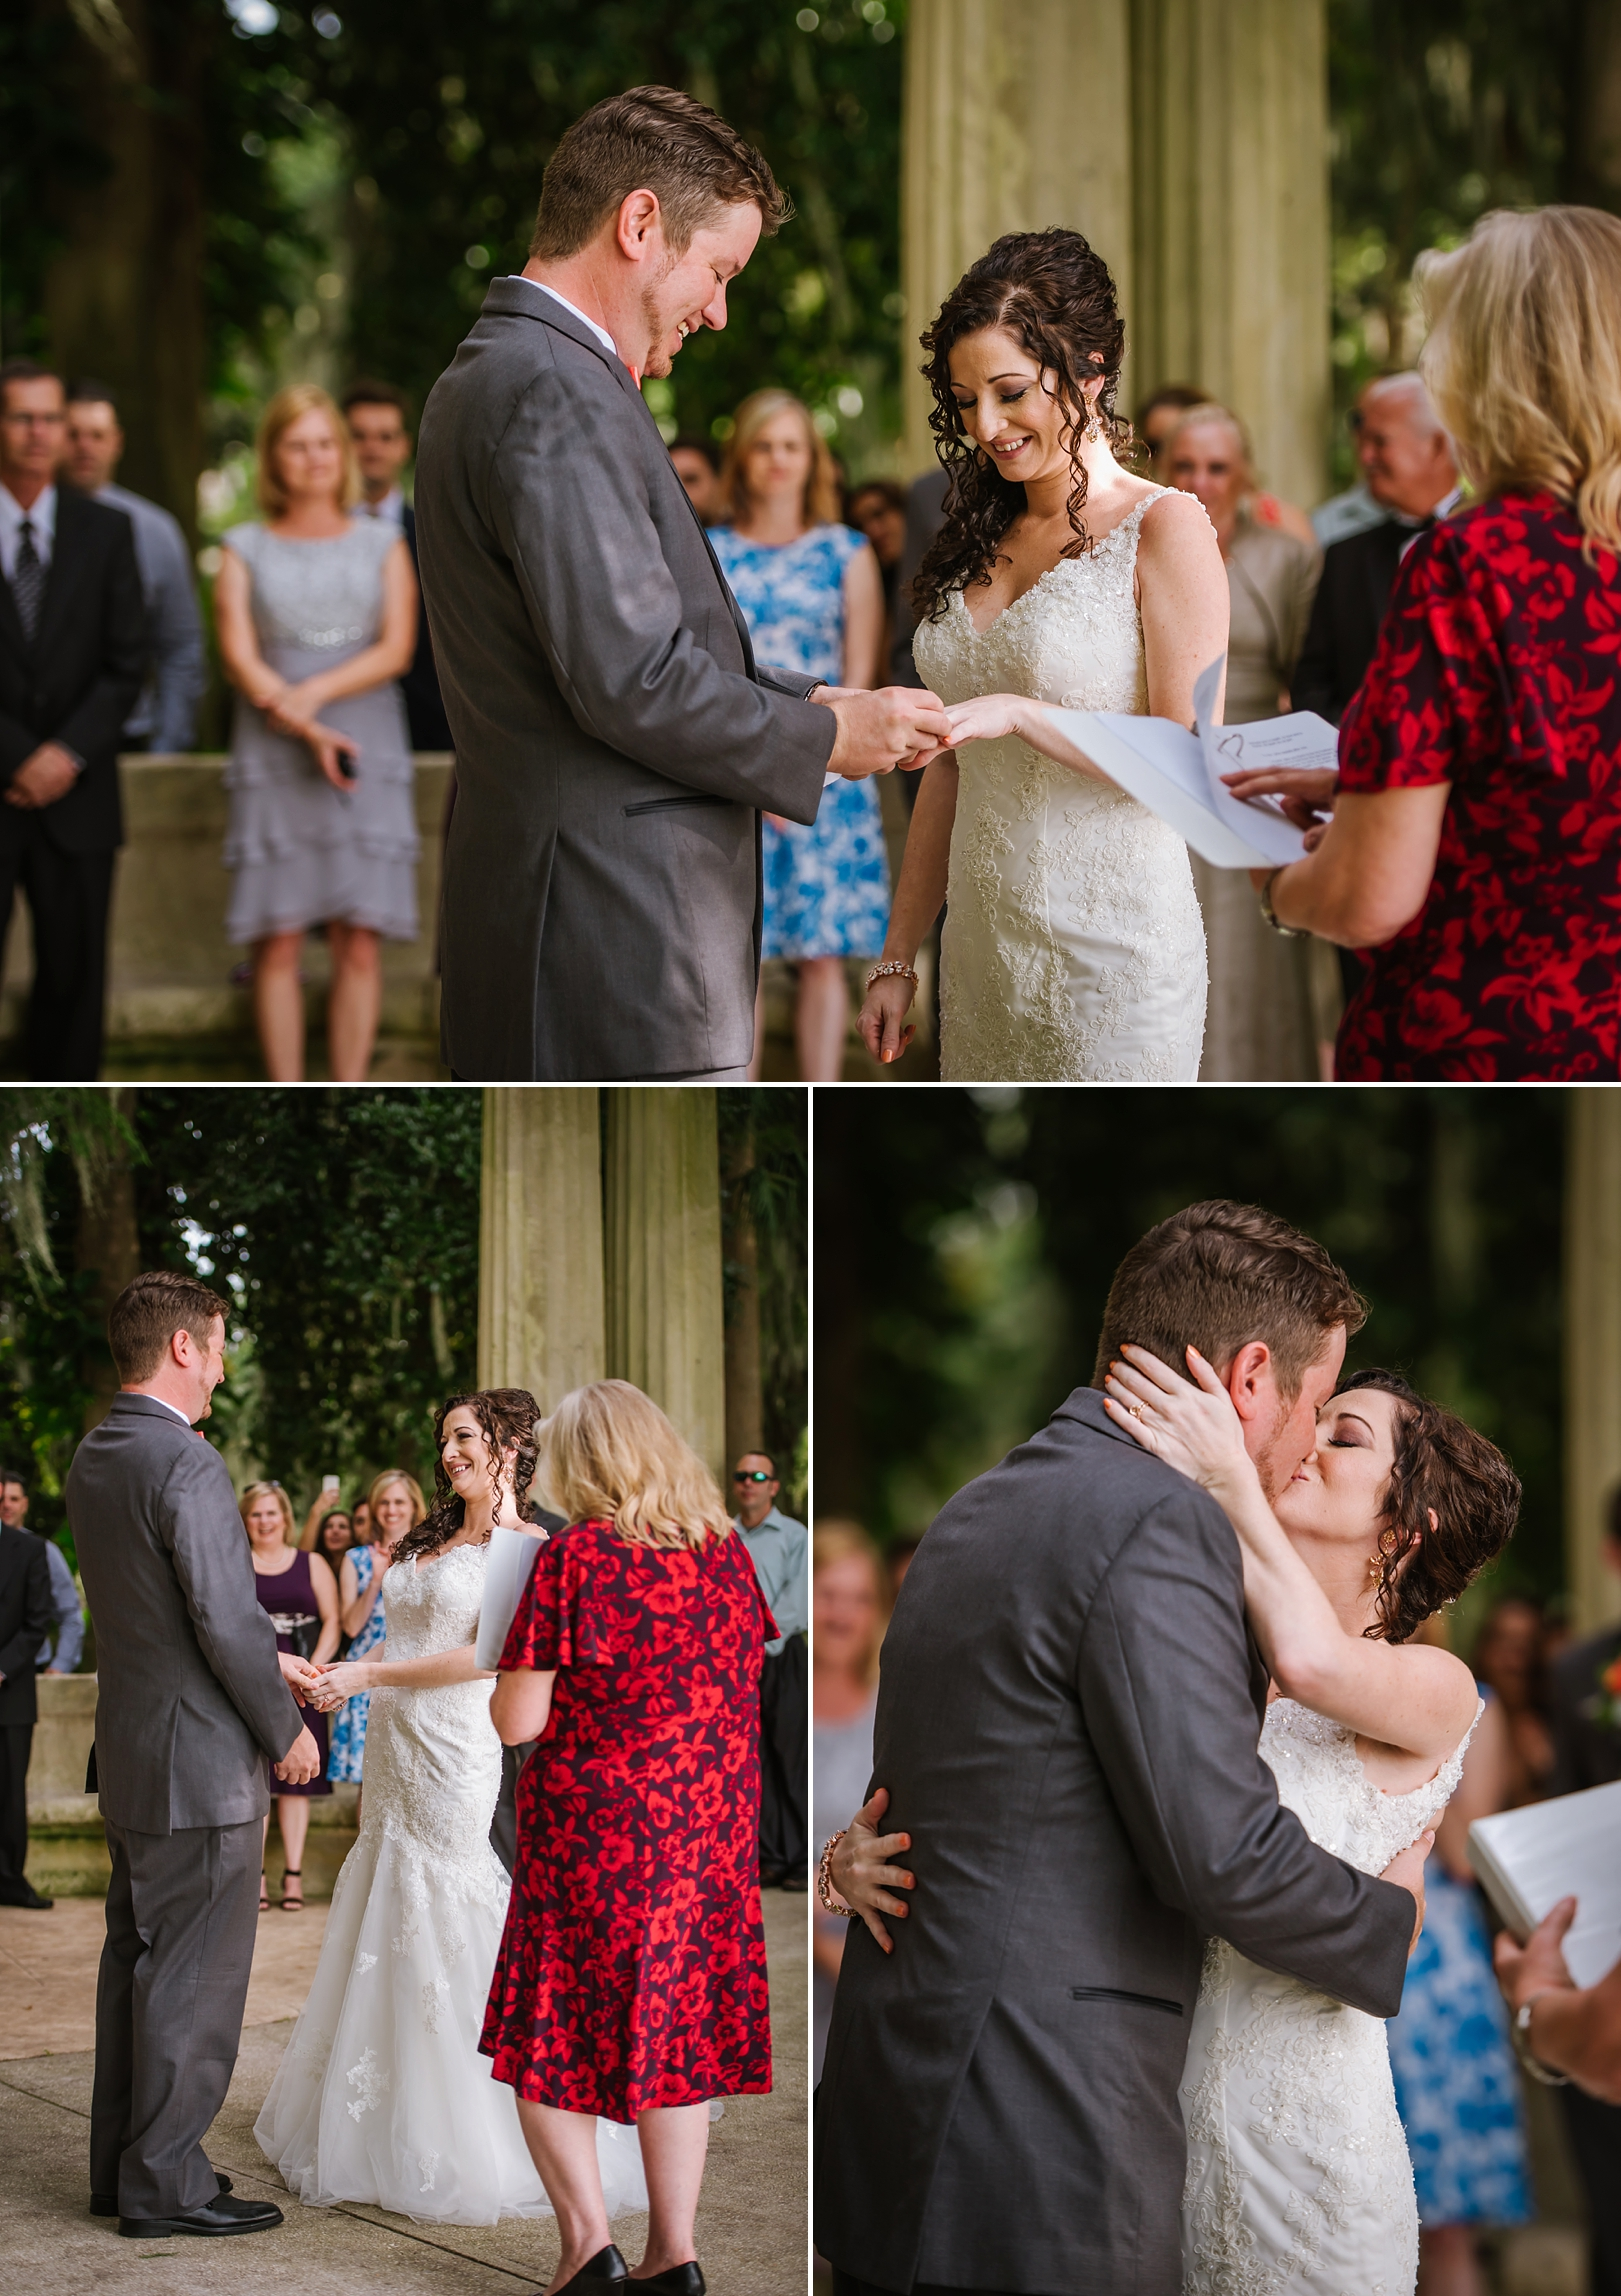 kraft-azalea-gardens-stylish-elopment-wedding-photography_0013.jpg